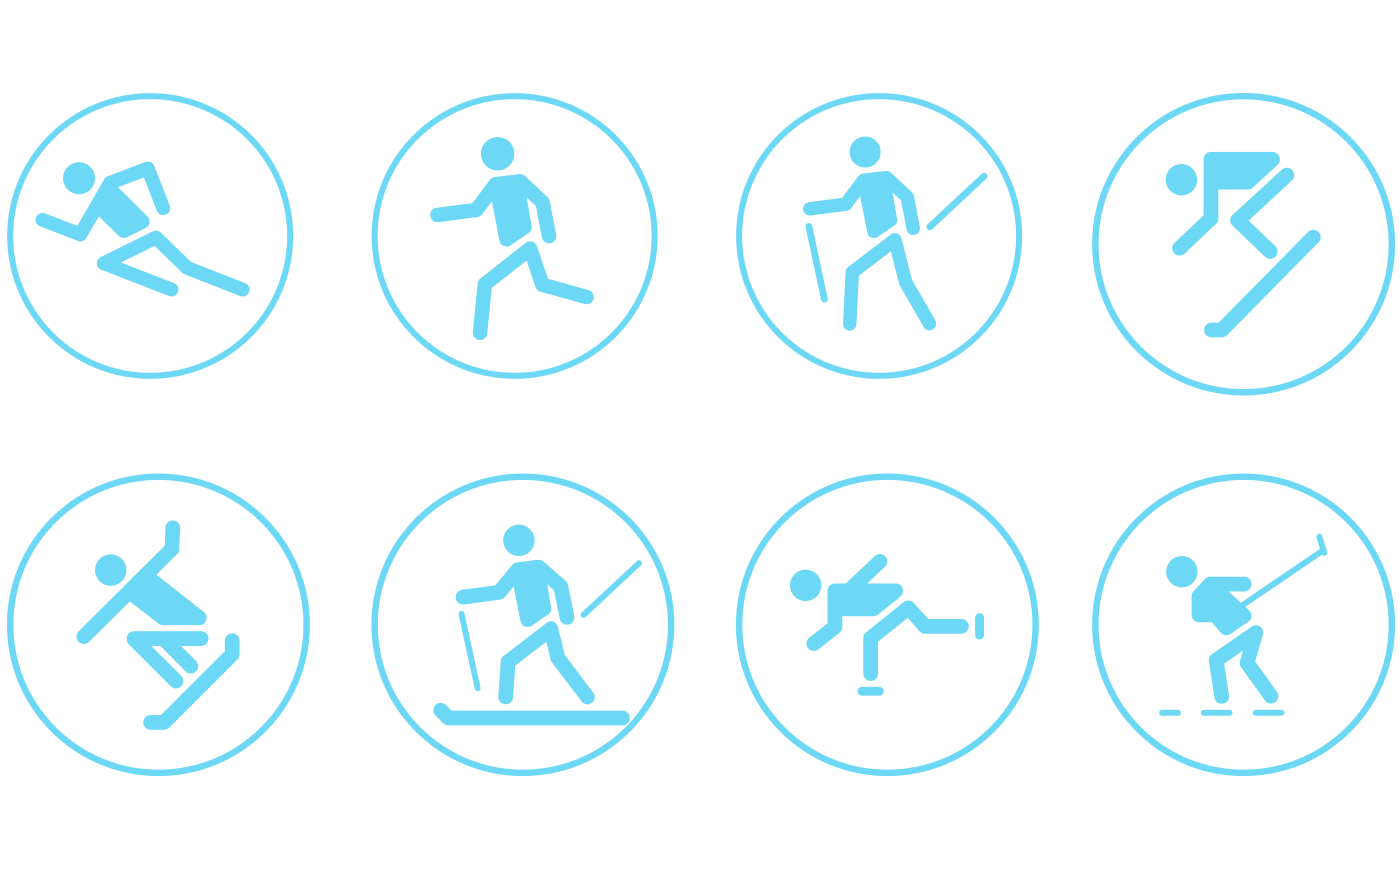 cyclos bauerfeind bandage stuetzstrumpf icons piktogramme grafiken